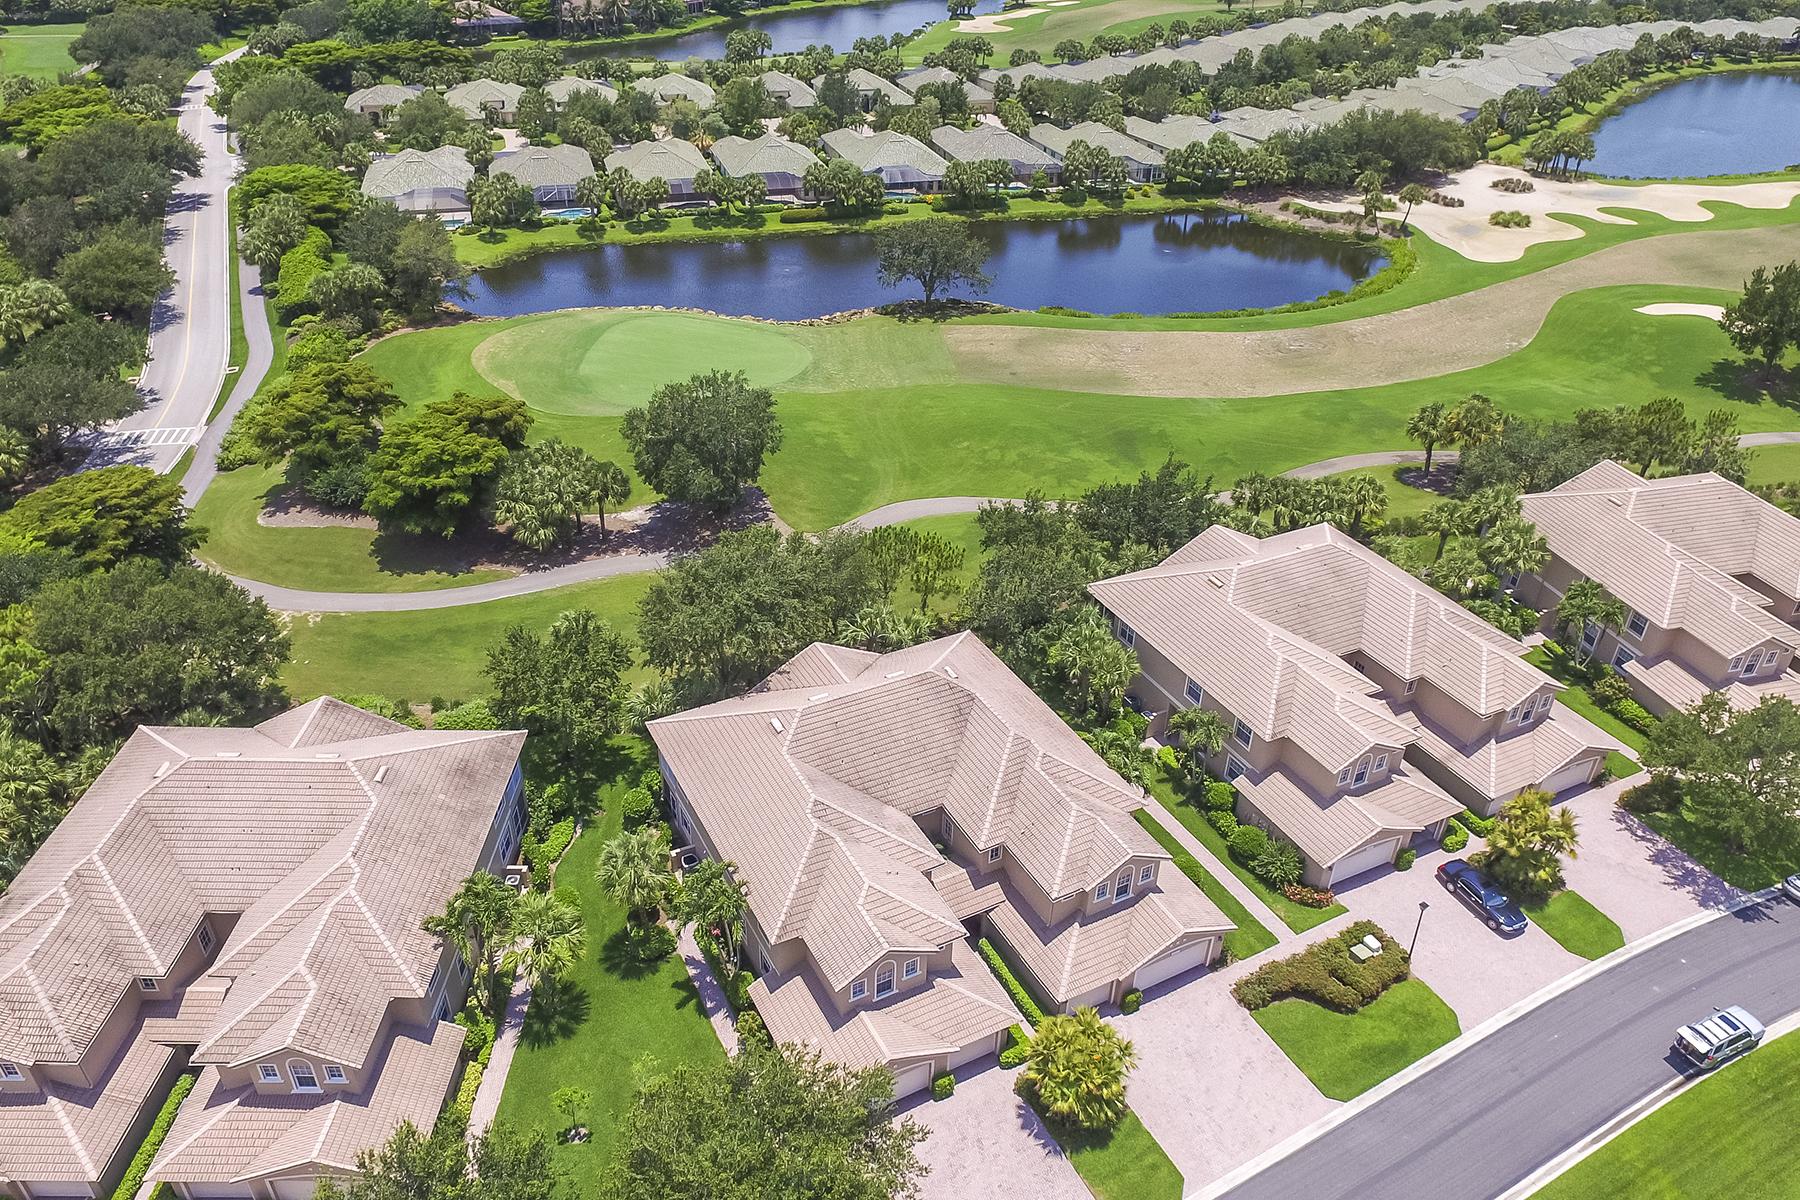 Condominio por un Venta en THE BROOKS - PALMETT RIDGE AT SHADOW WOOD - THE B 9261 Palmetto Ridge Dr 202 Estero, Florida, 34135 Estados Unidos